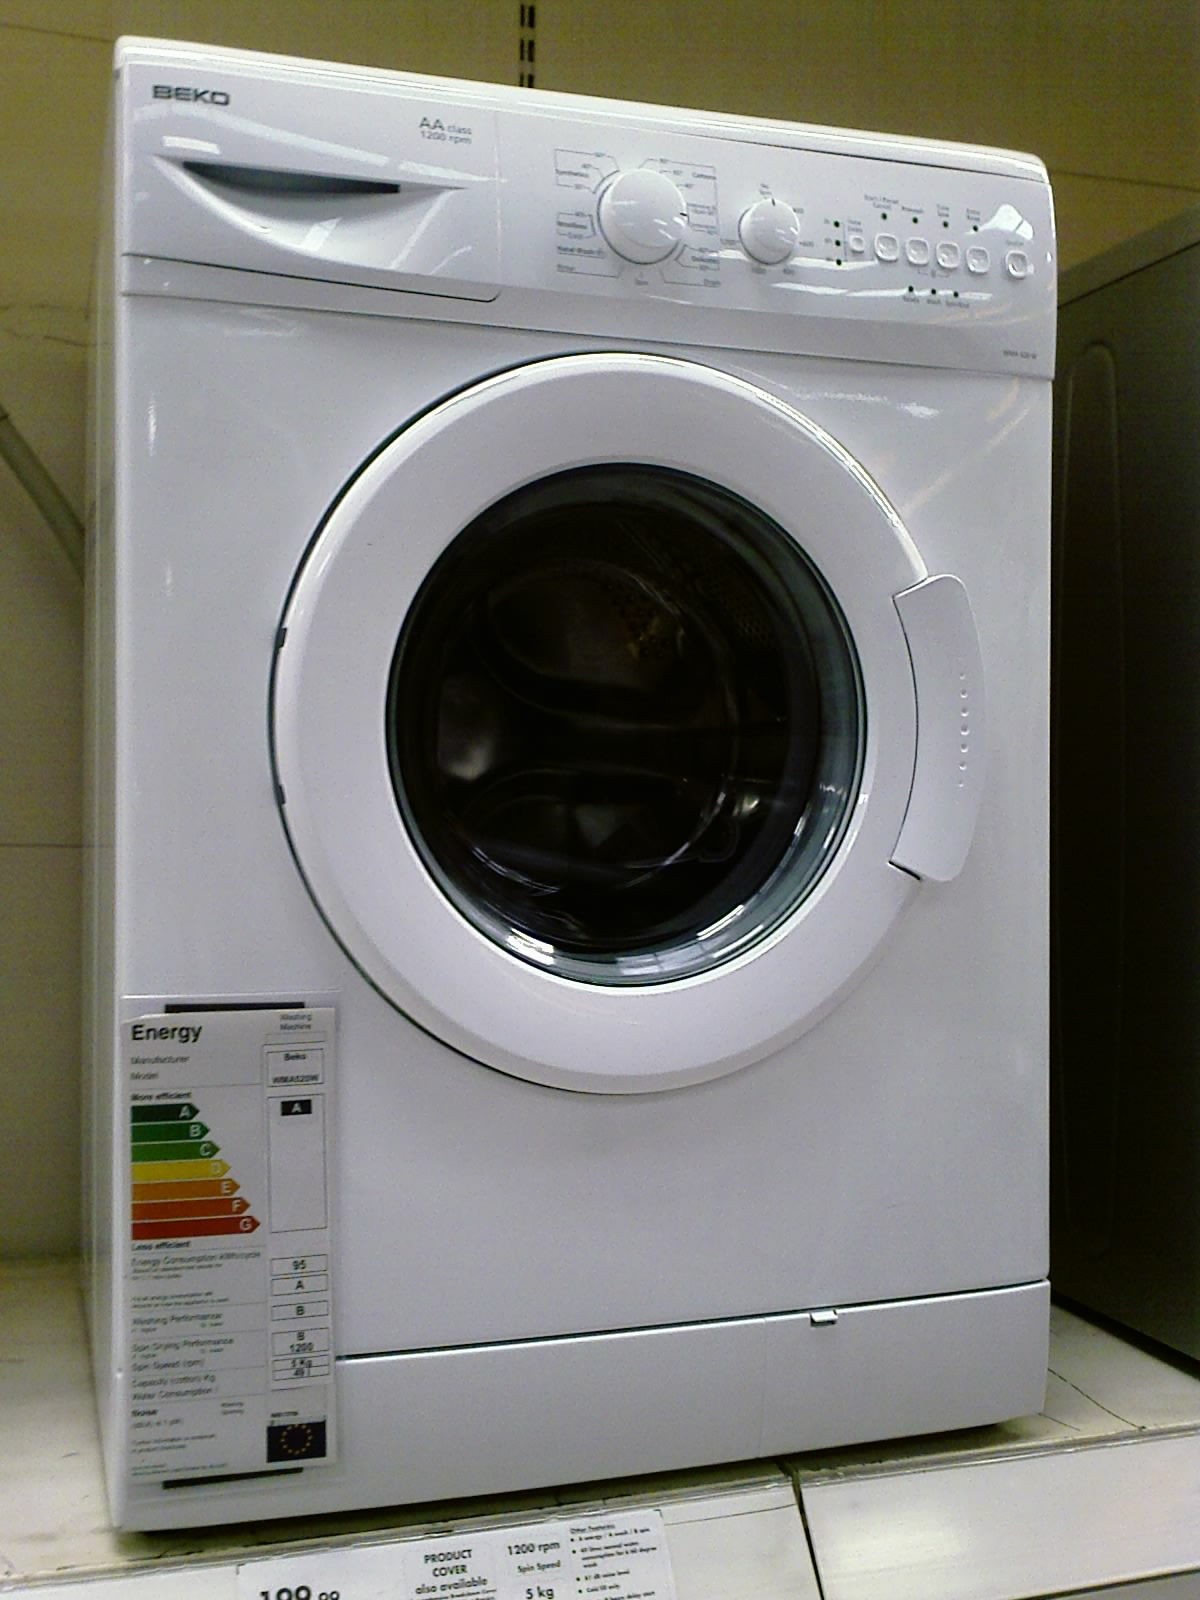 Washing_Machine_Beko.jpg